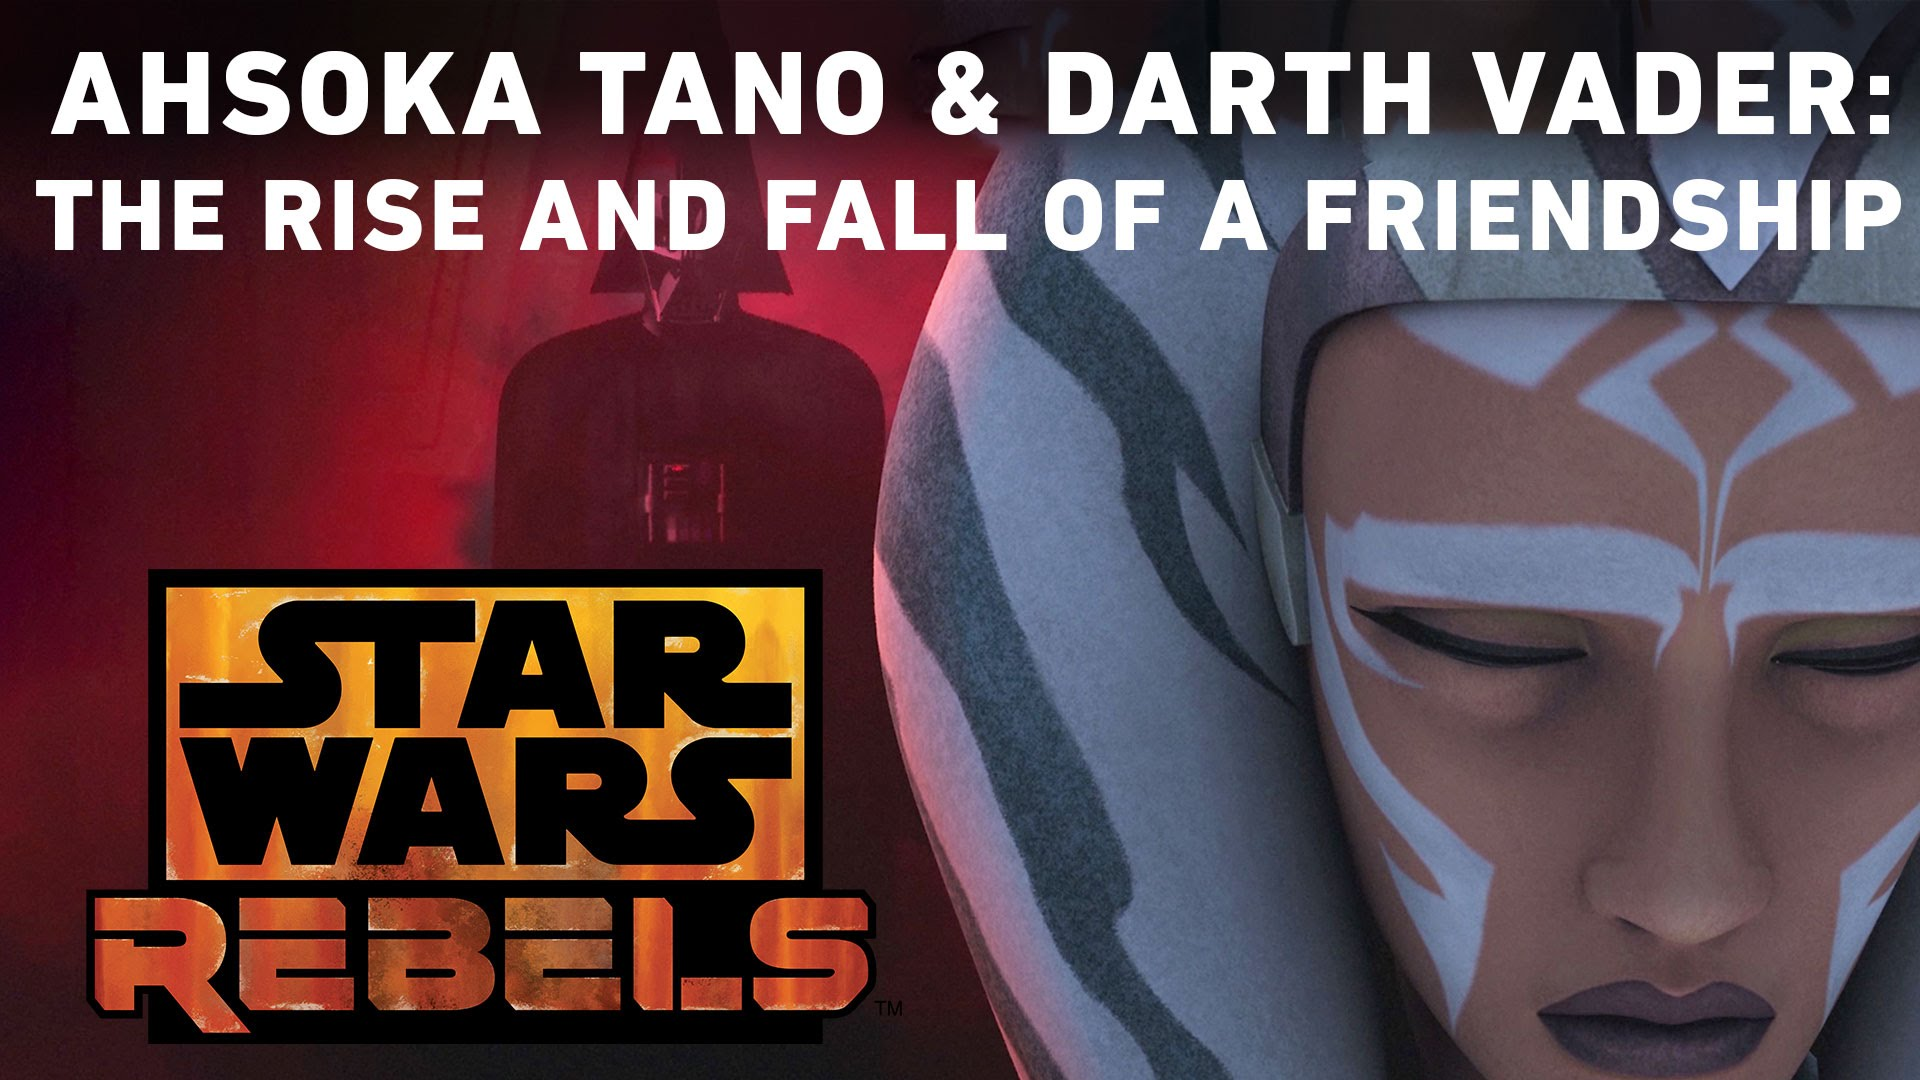 Ahsoka Tano and Darth Vader: The Rise and Fall of a Friendship | Star Wars Rebels